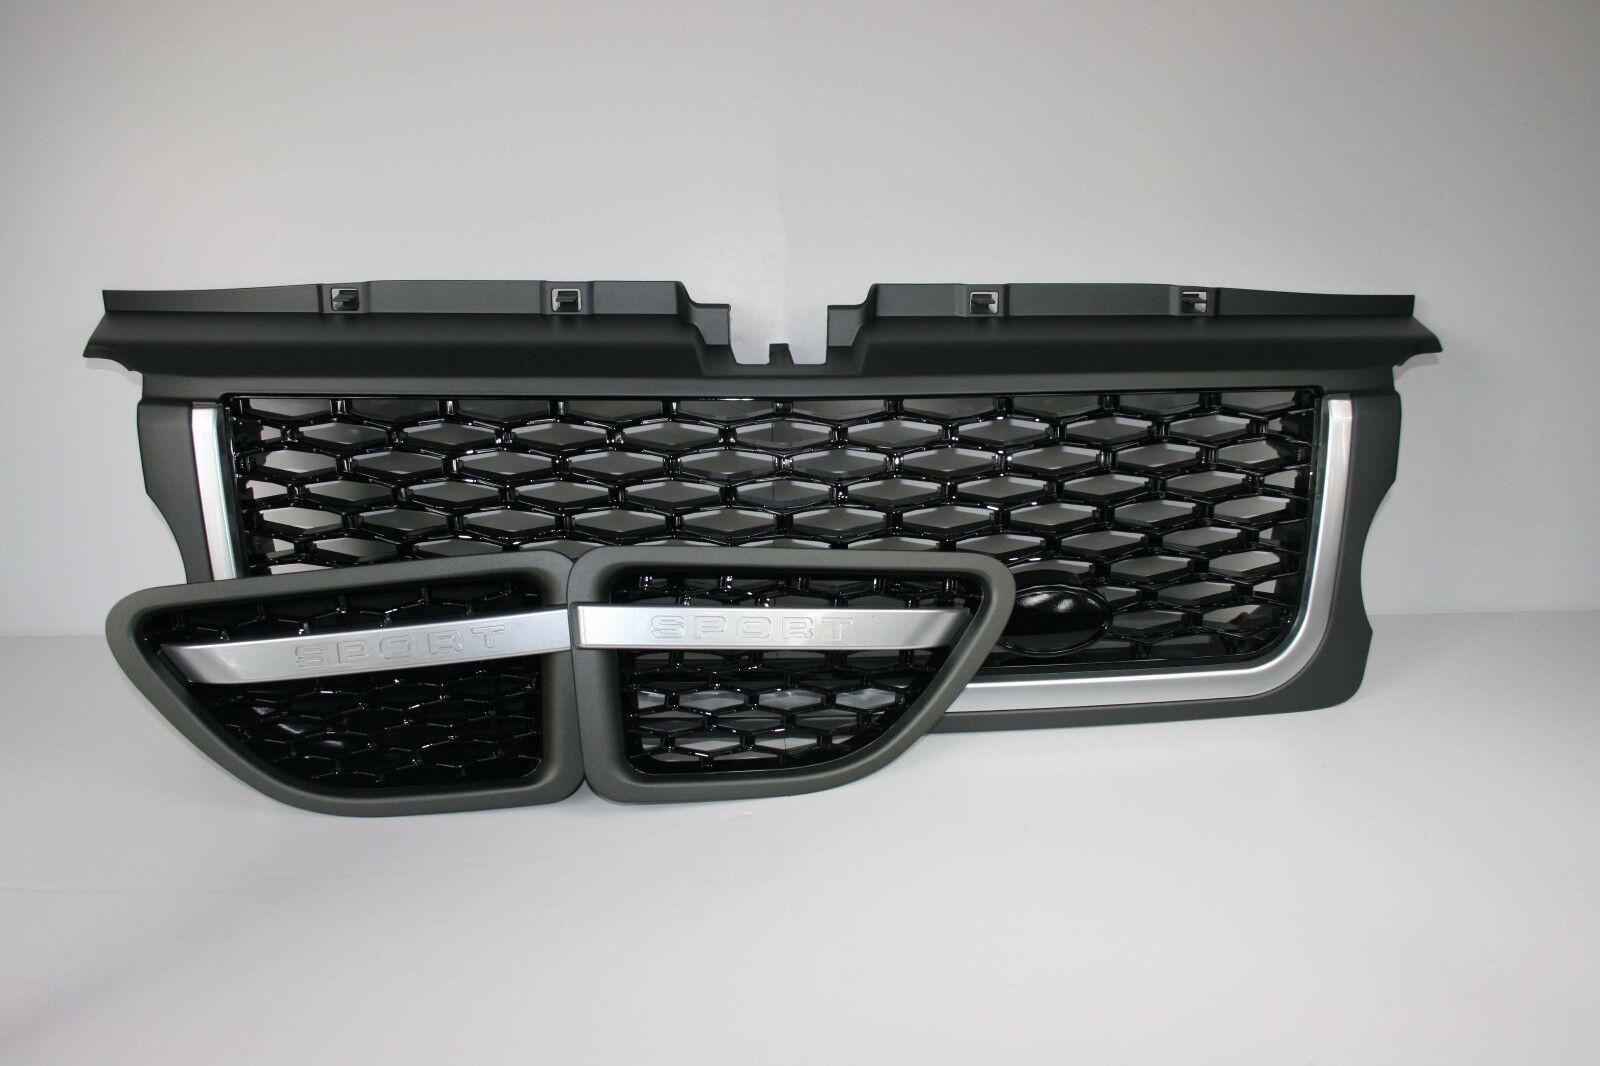 SVA Front Grille Gloss Black /& Chrome Trim  Fits Range Rover Vogue L322  2005-9